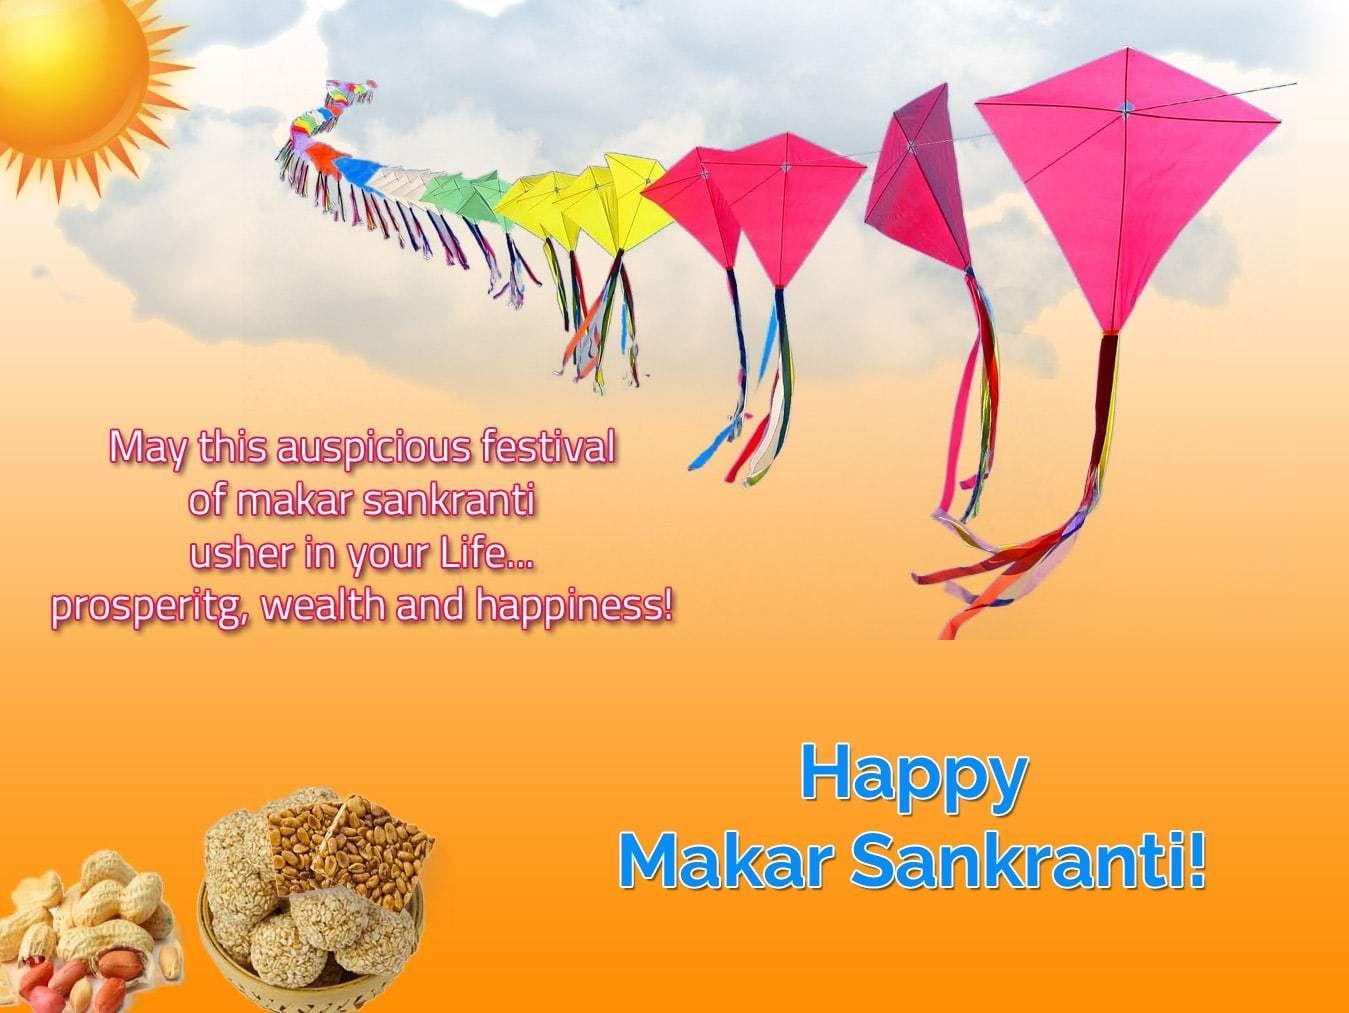 Makar Sankranti Greetings Wallpaper Free Psd Design Pinterest